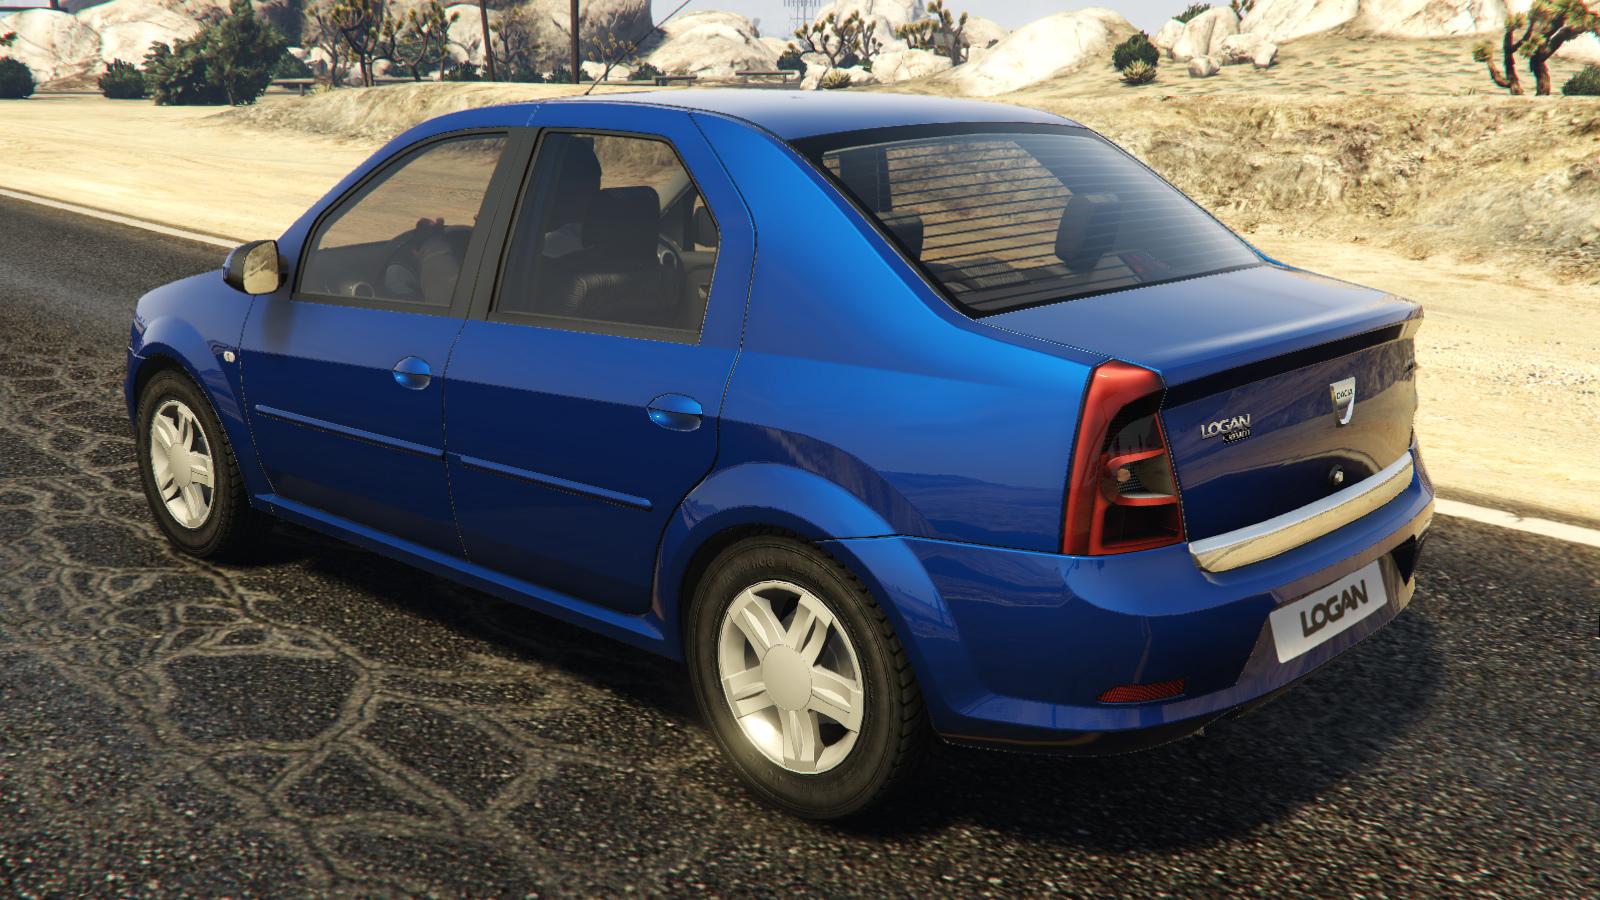 2008 Dacia Logan для GTA V - Скриншот 2